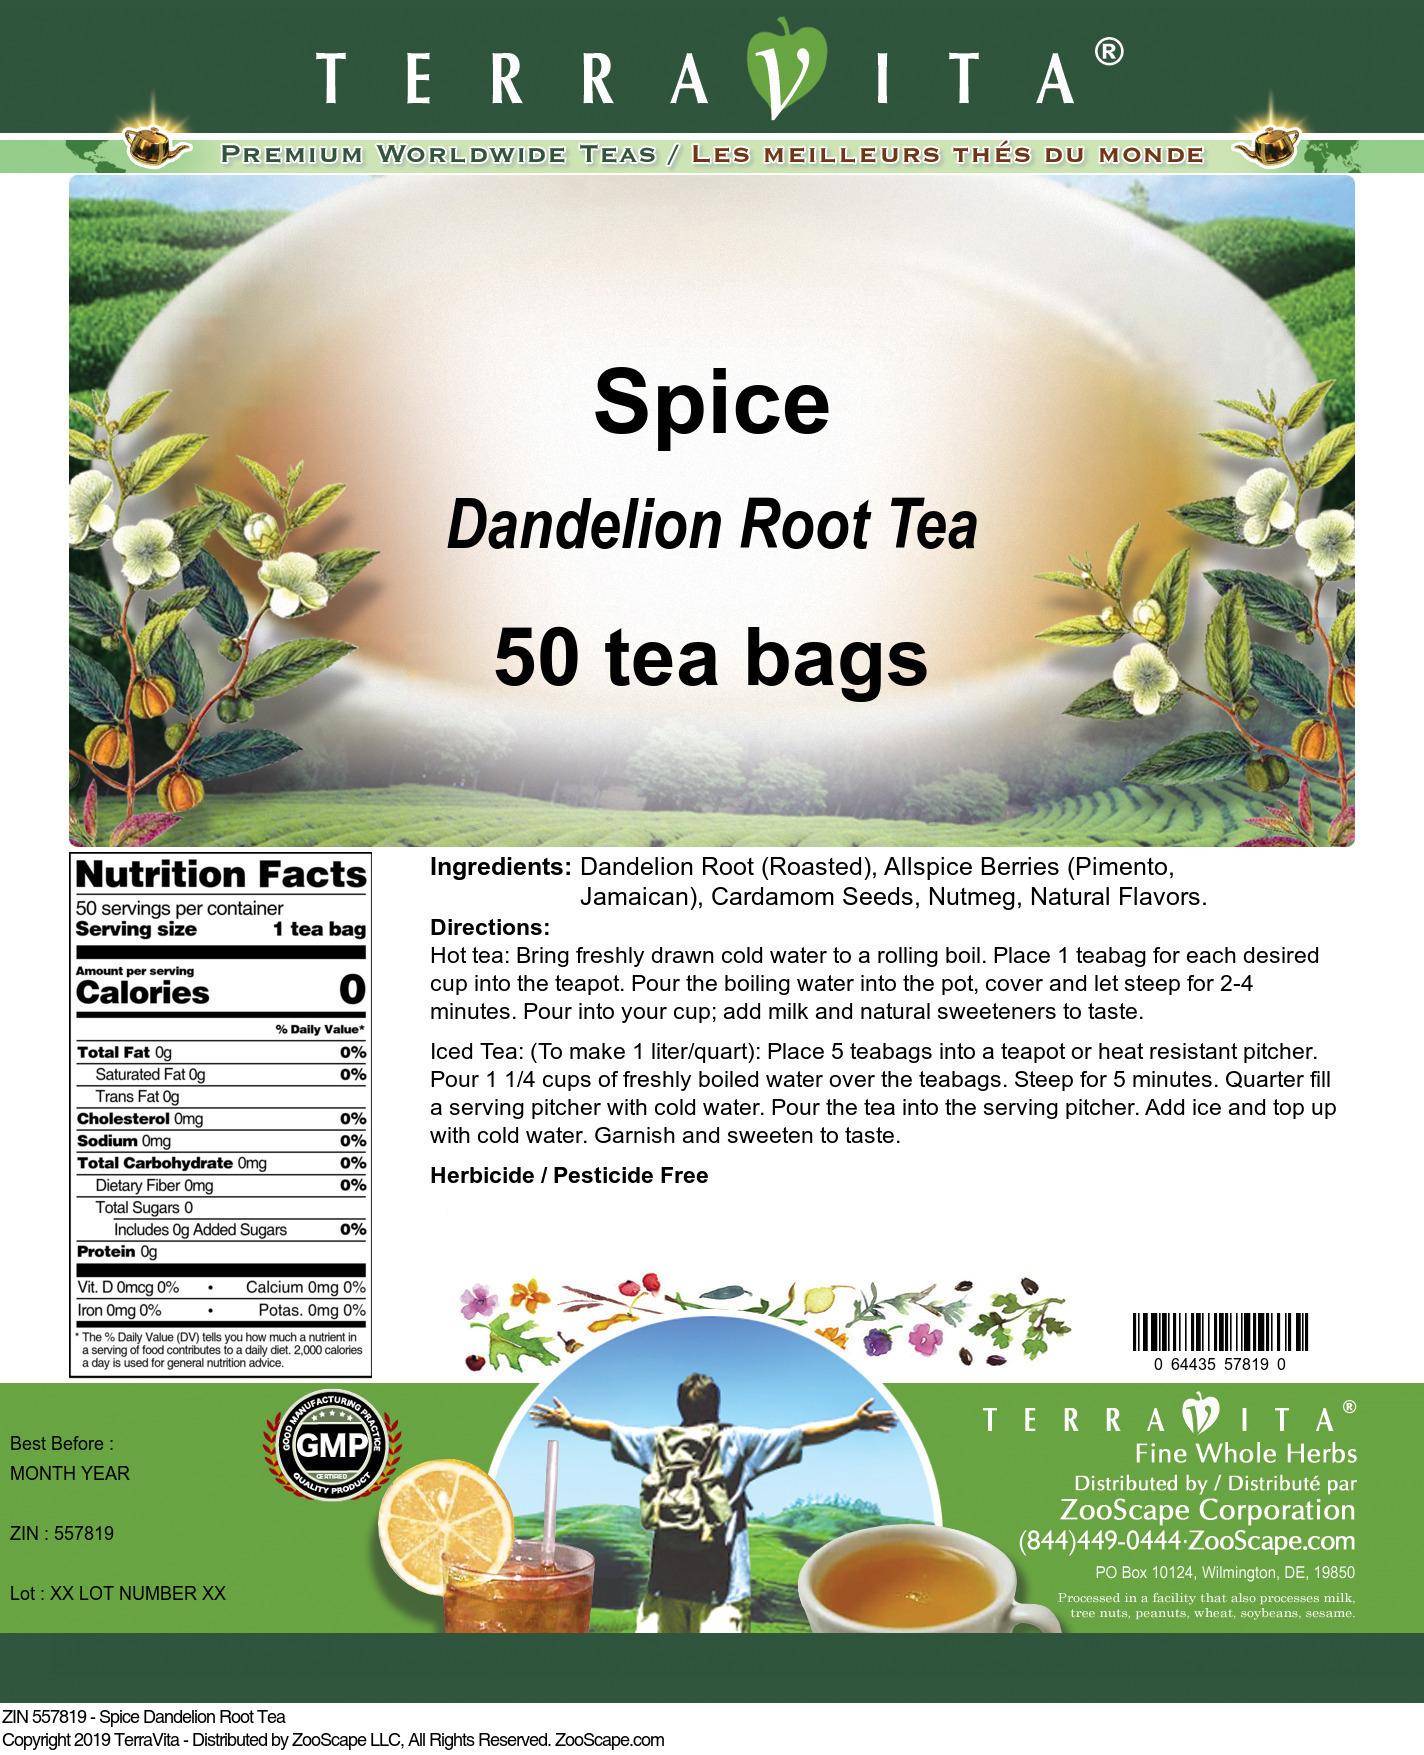 Spice Dandelion Root Tea